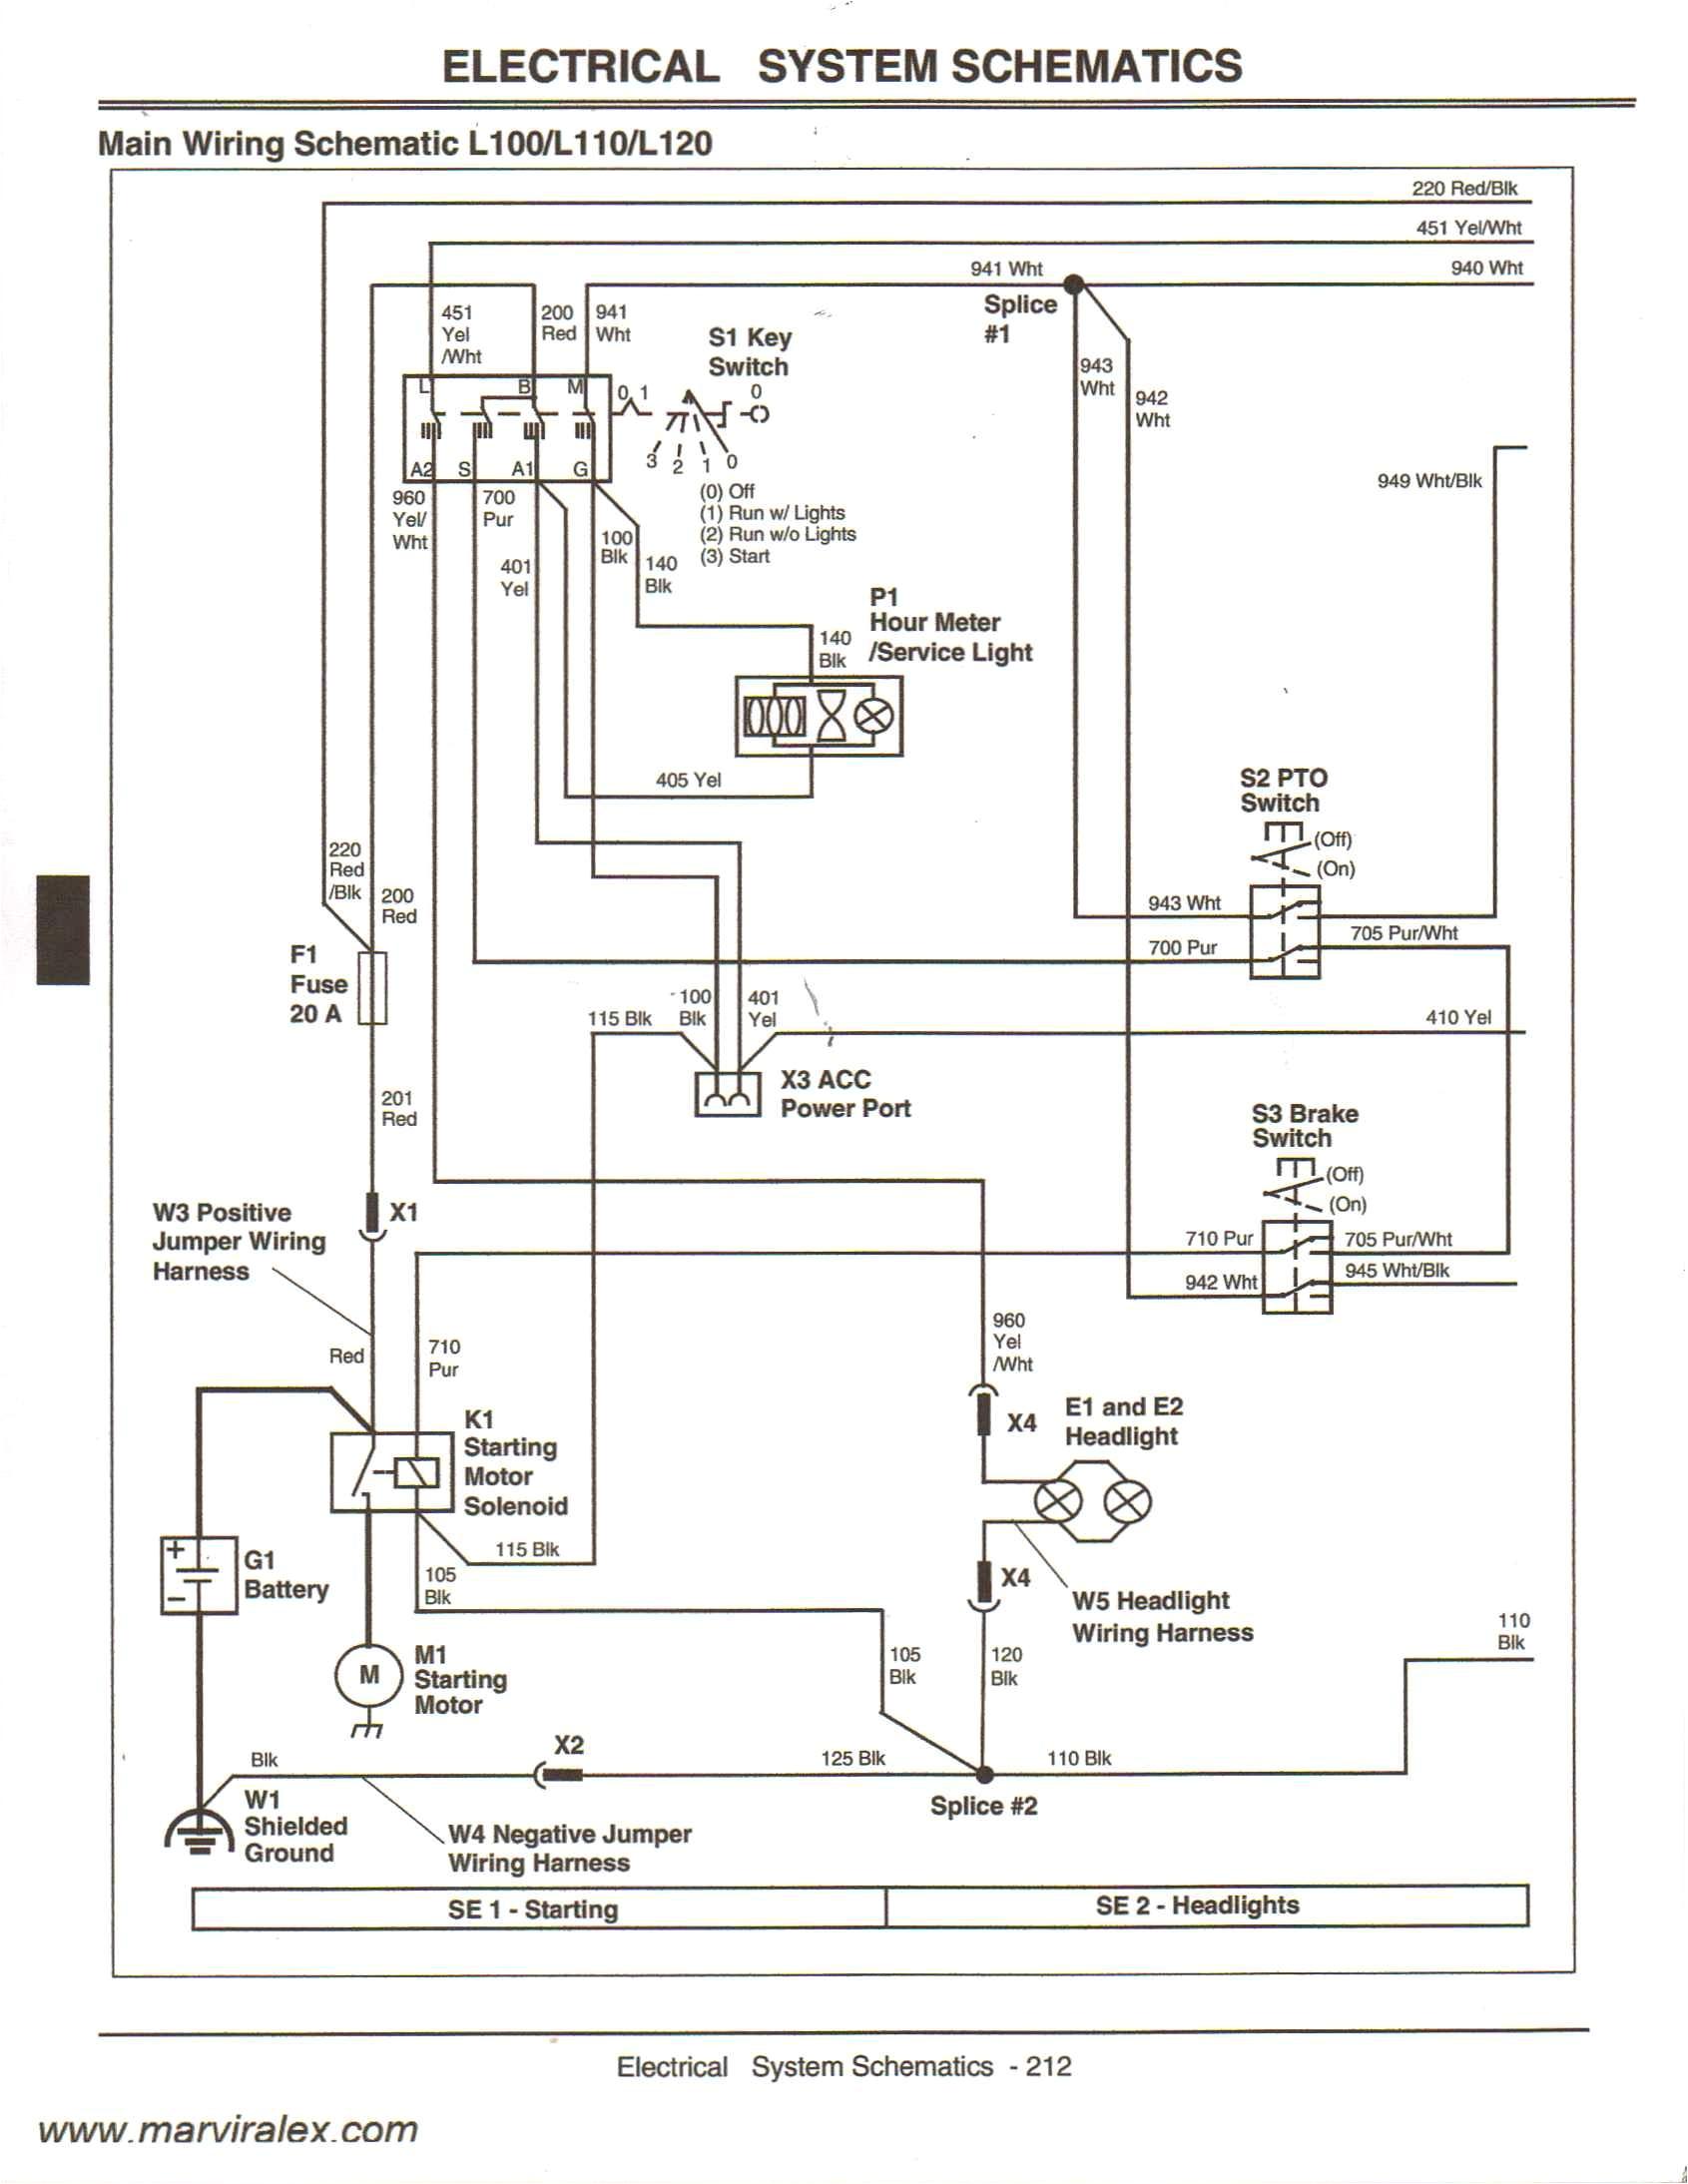 john deere 214 lawn tractor wiring diagram wiring diagram john deere wiring diagram on 210 ajilbab pictures